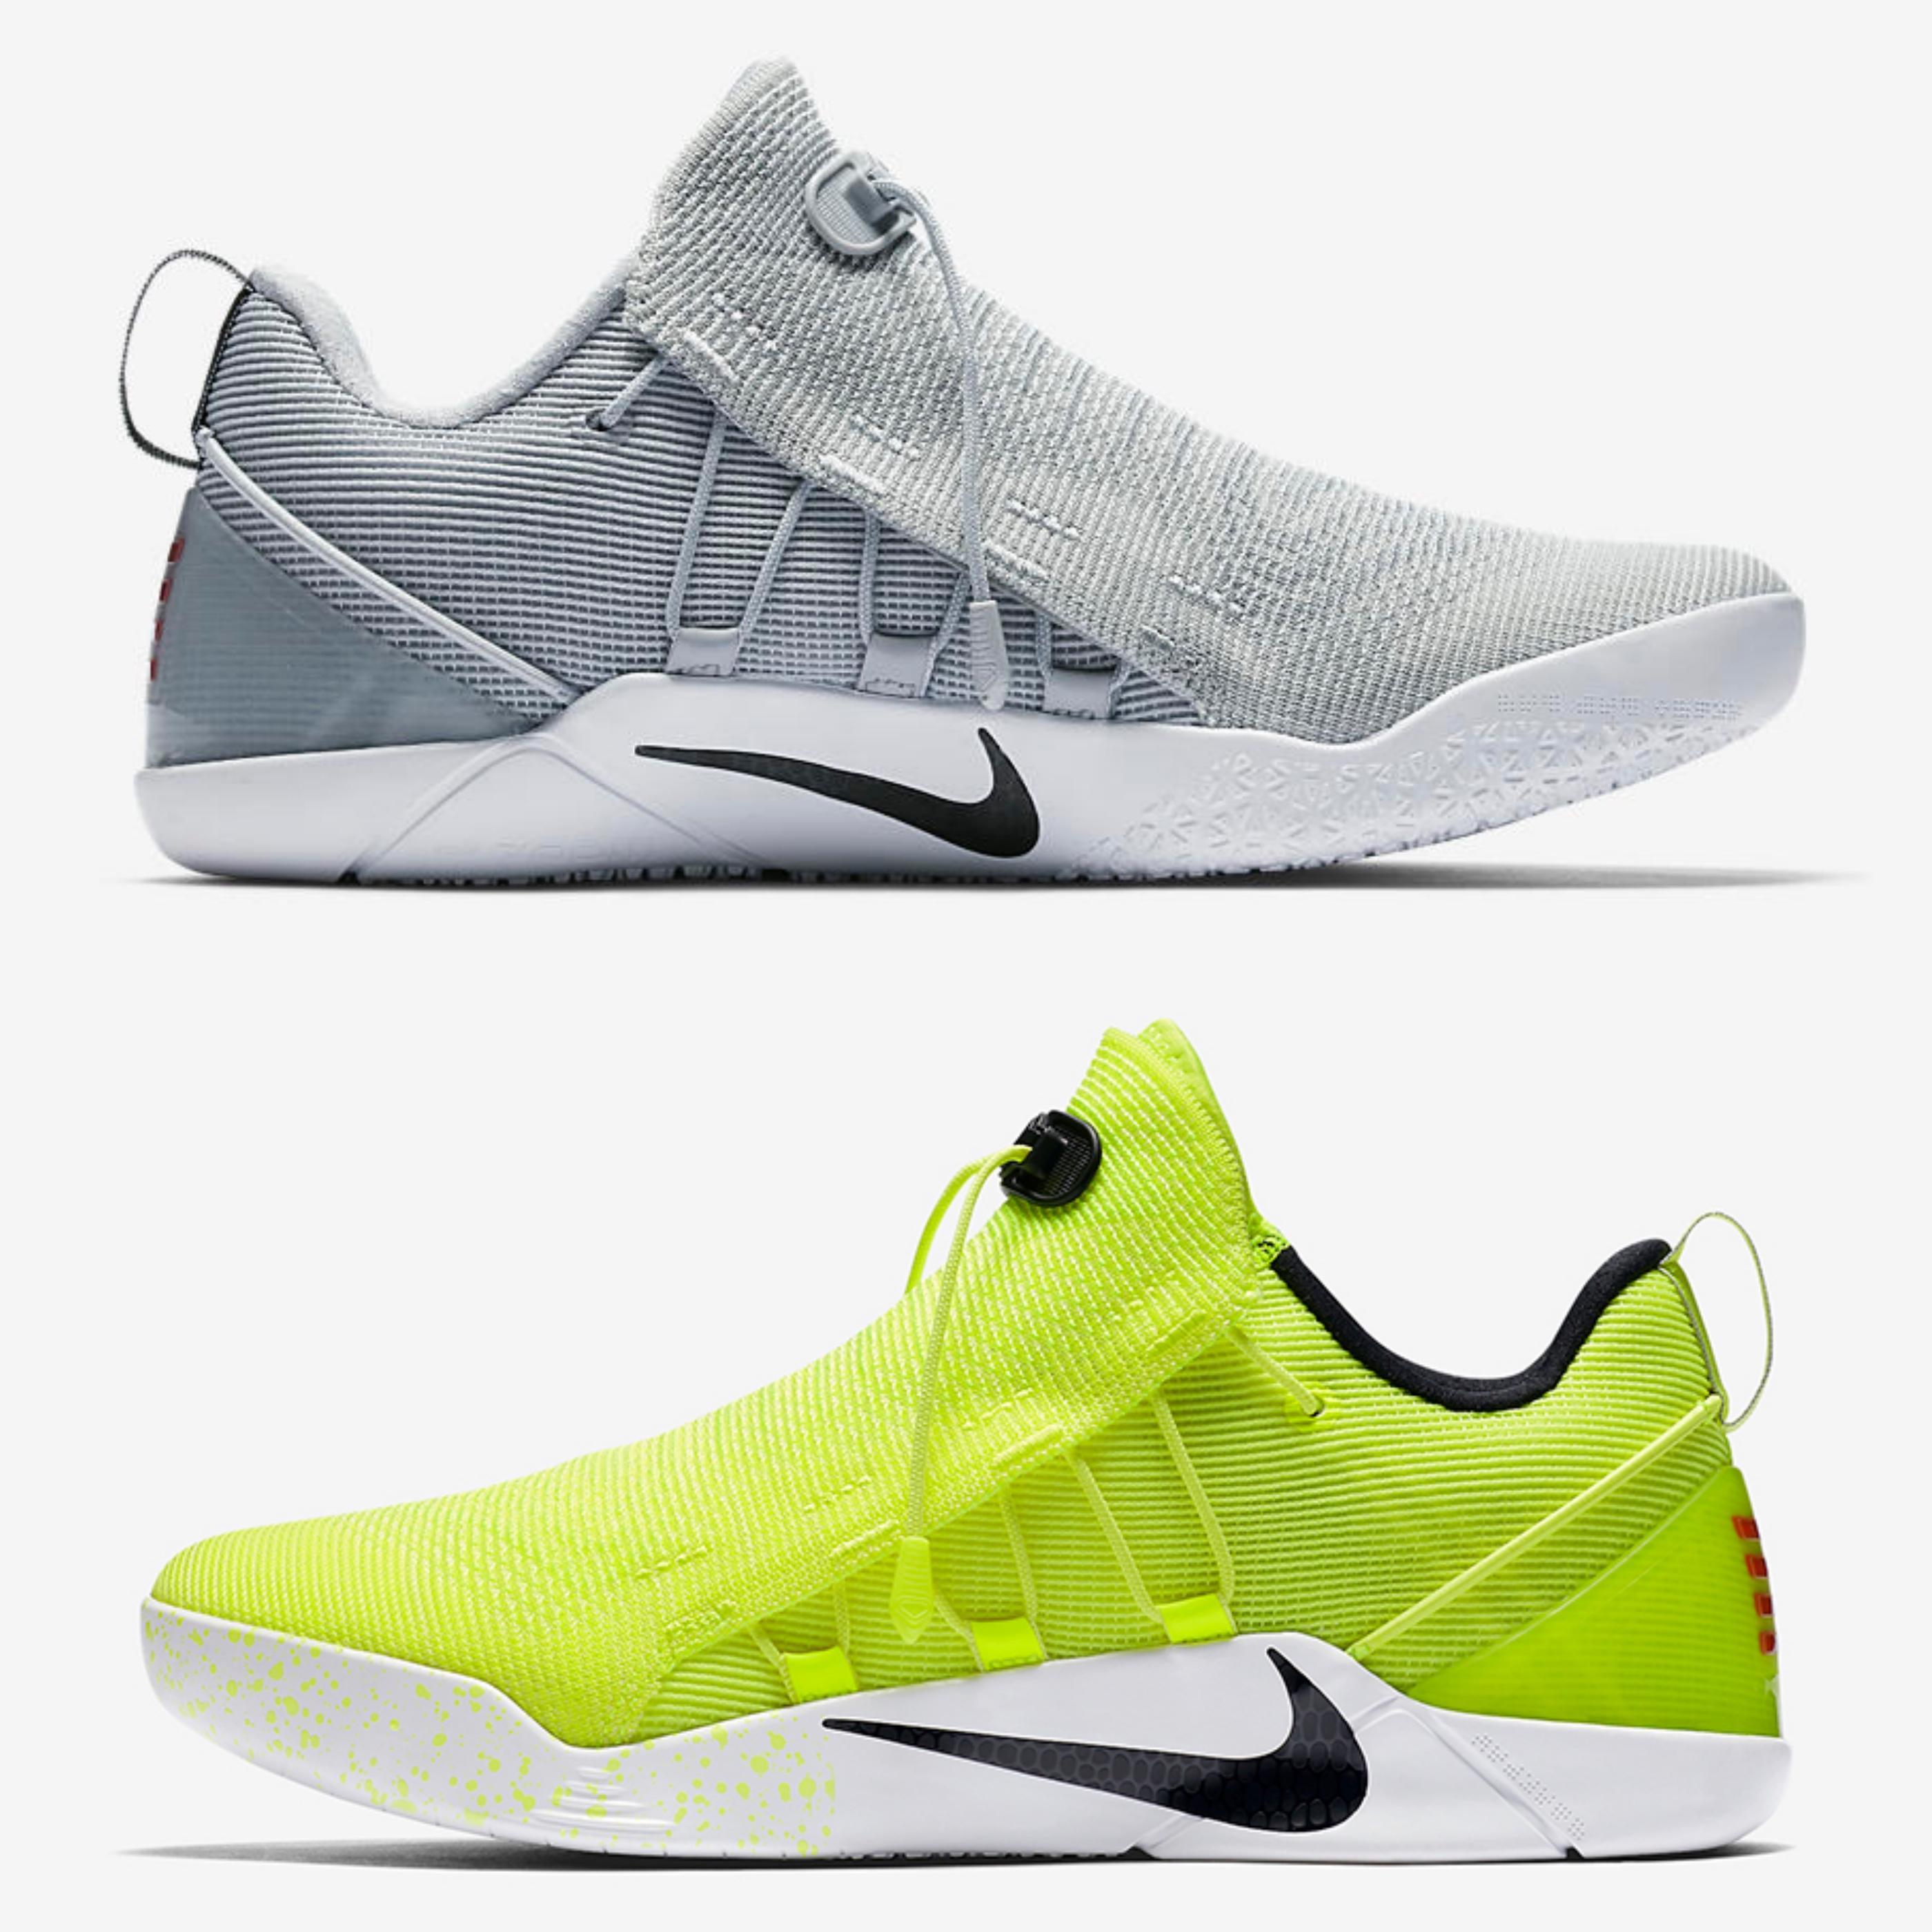 f39a54b8b5b Nike Kobe AD Archives - WearTesters